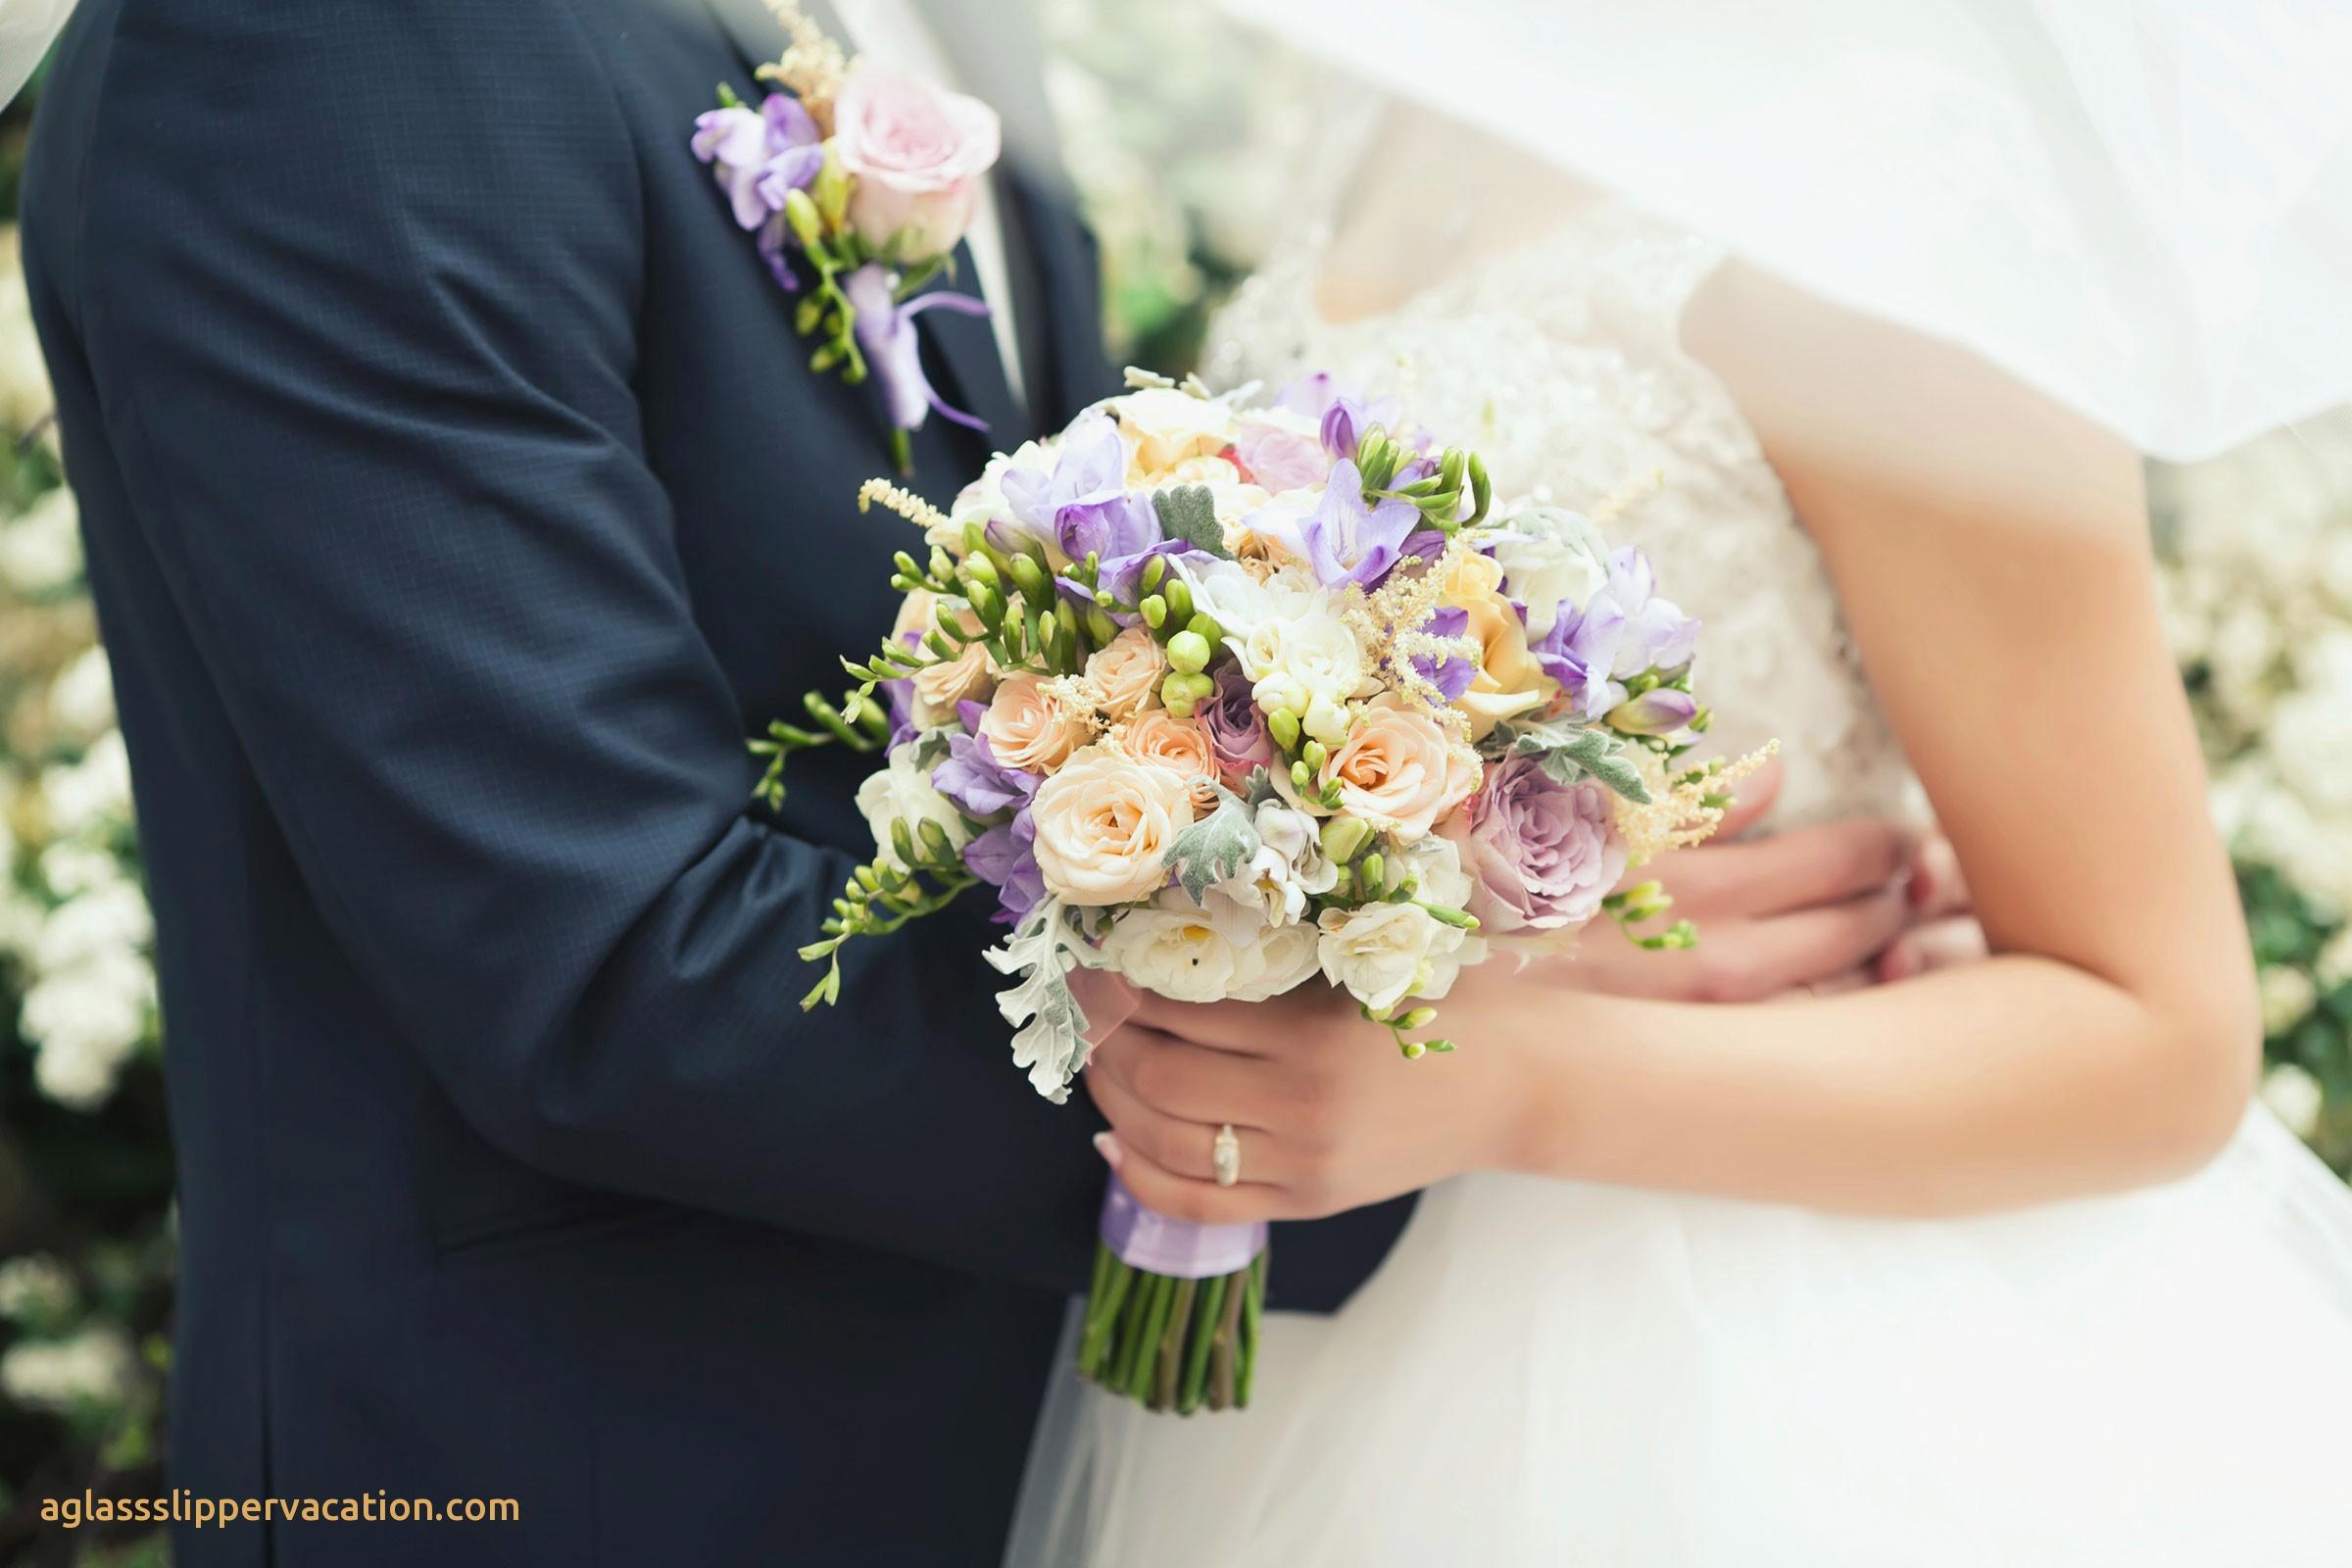 grocery store wedding flowers photo - 1